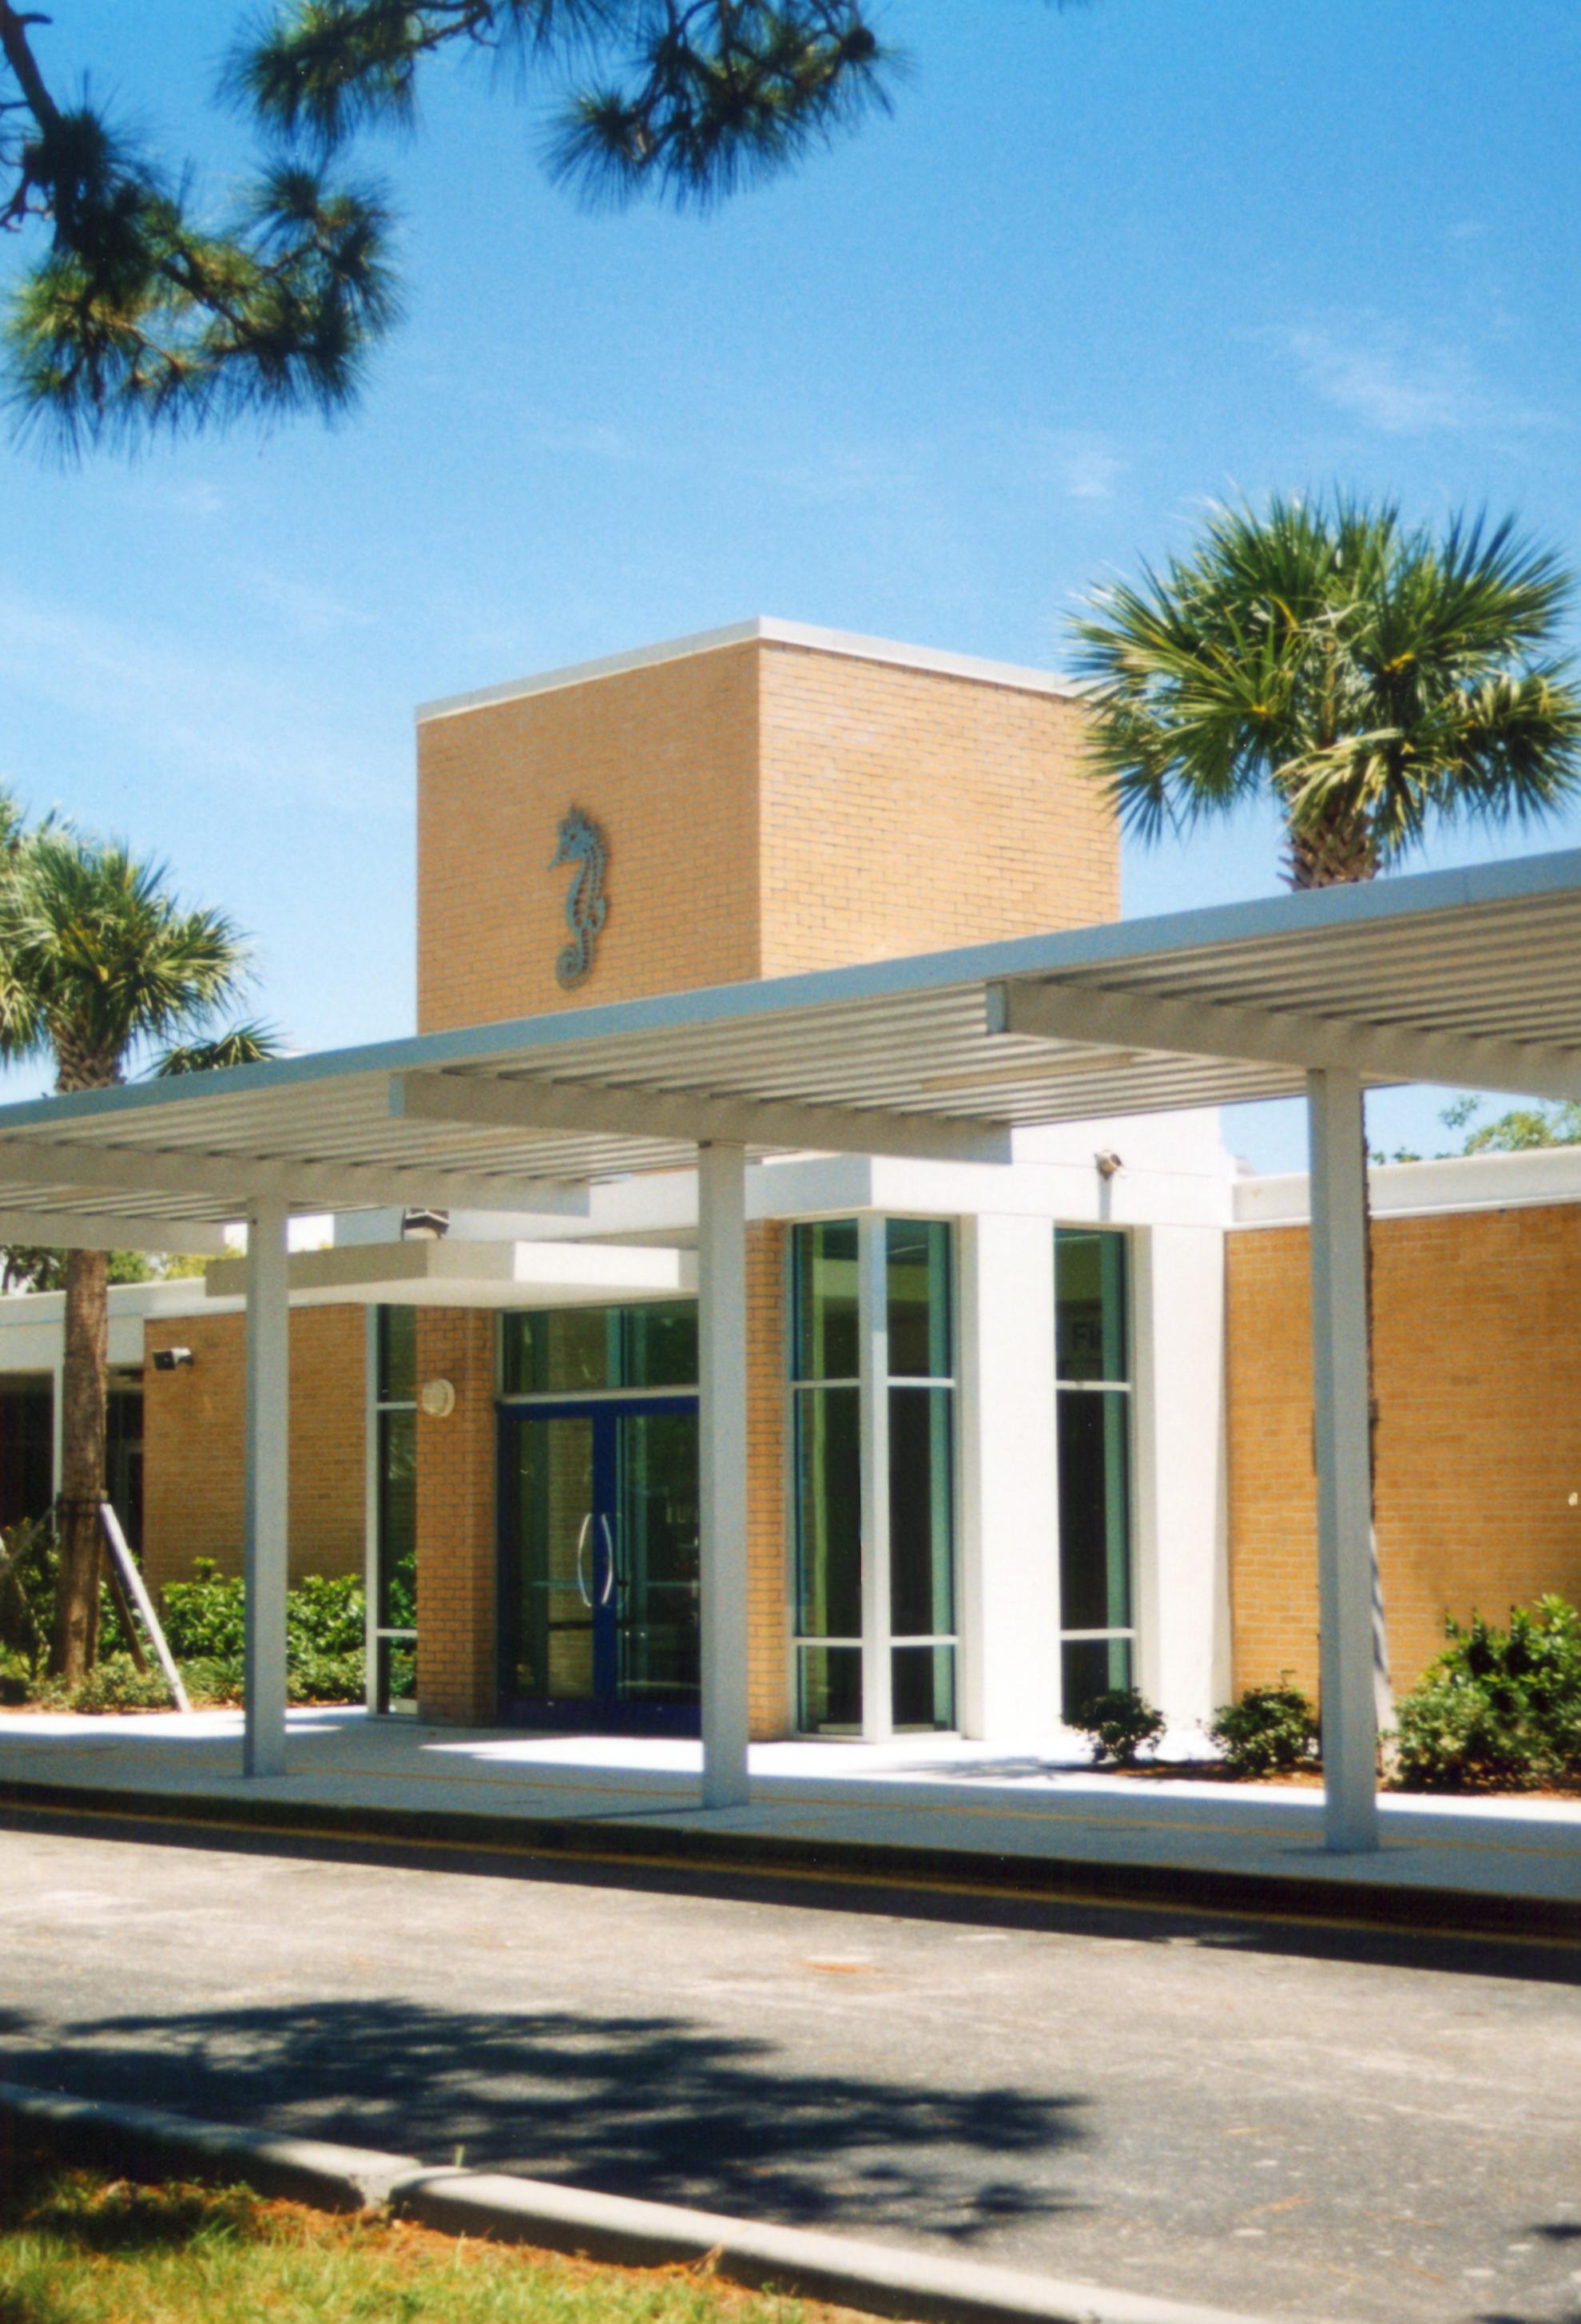 Sea Gate Elementary